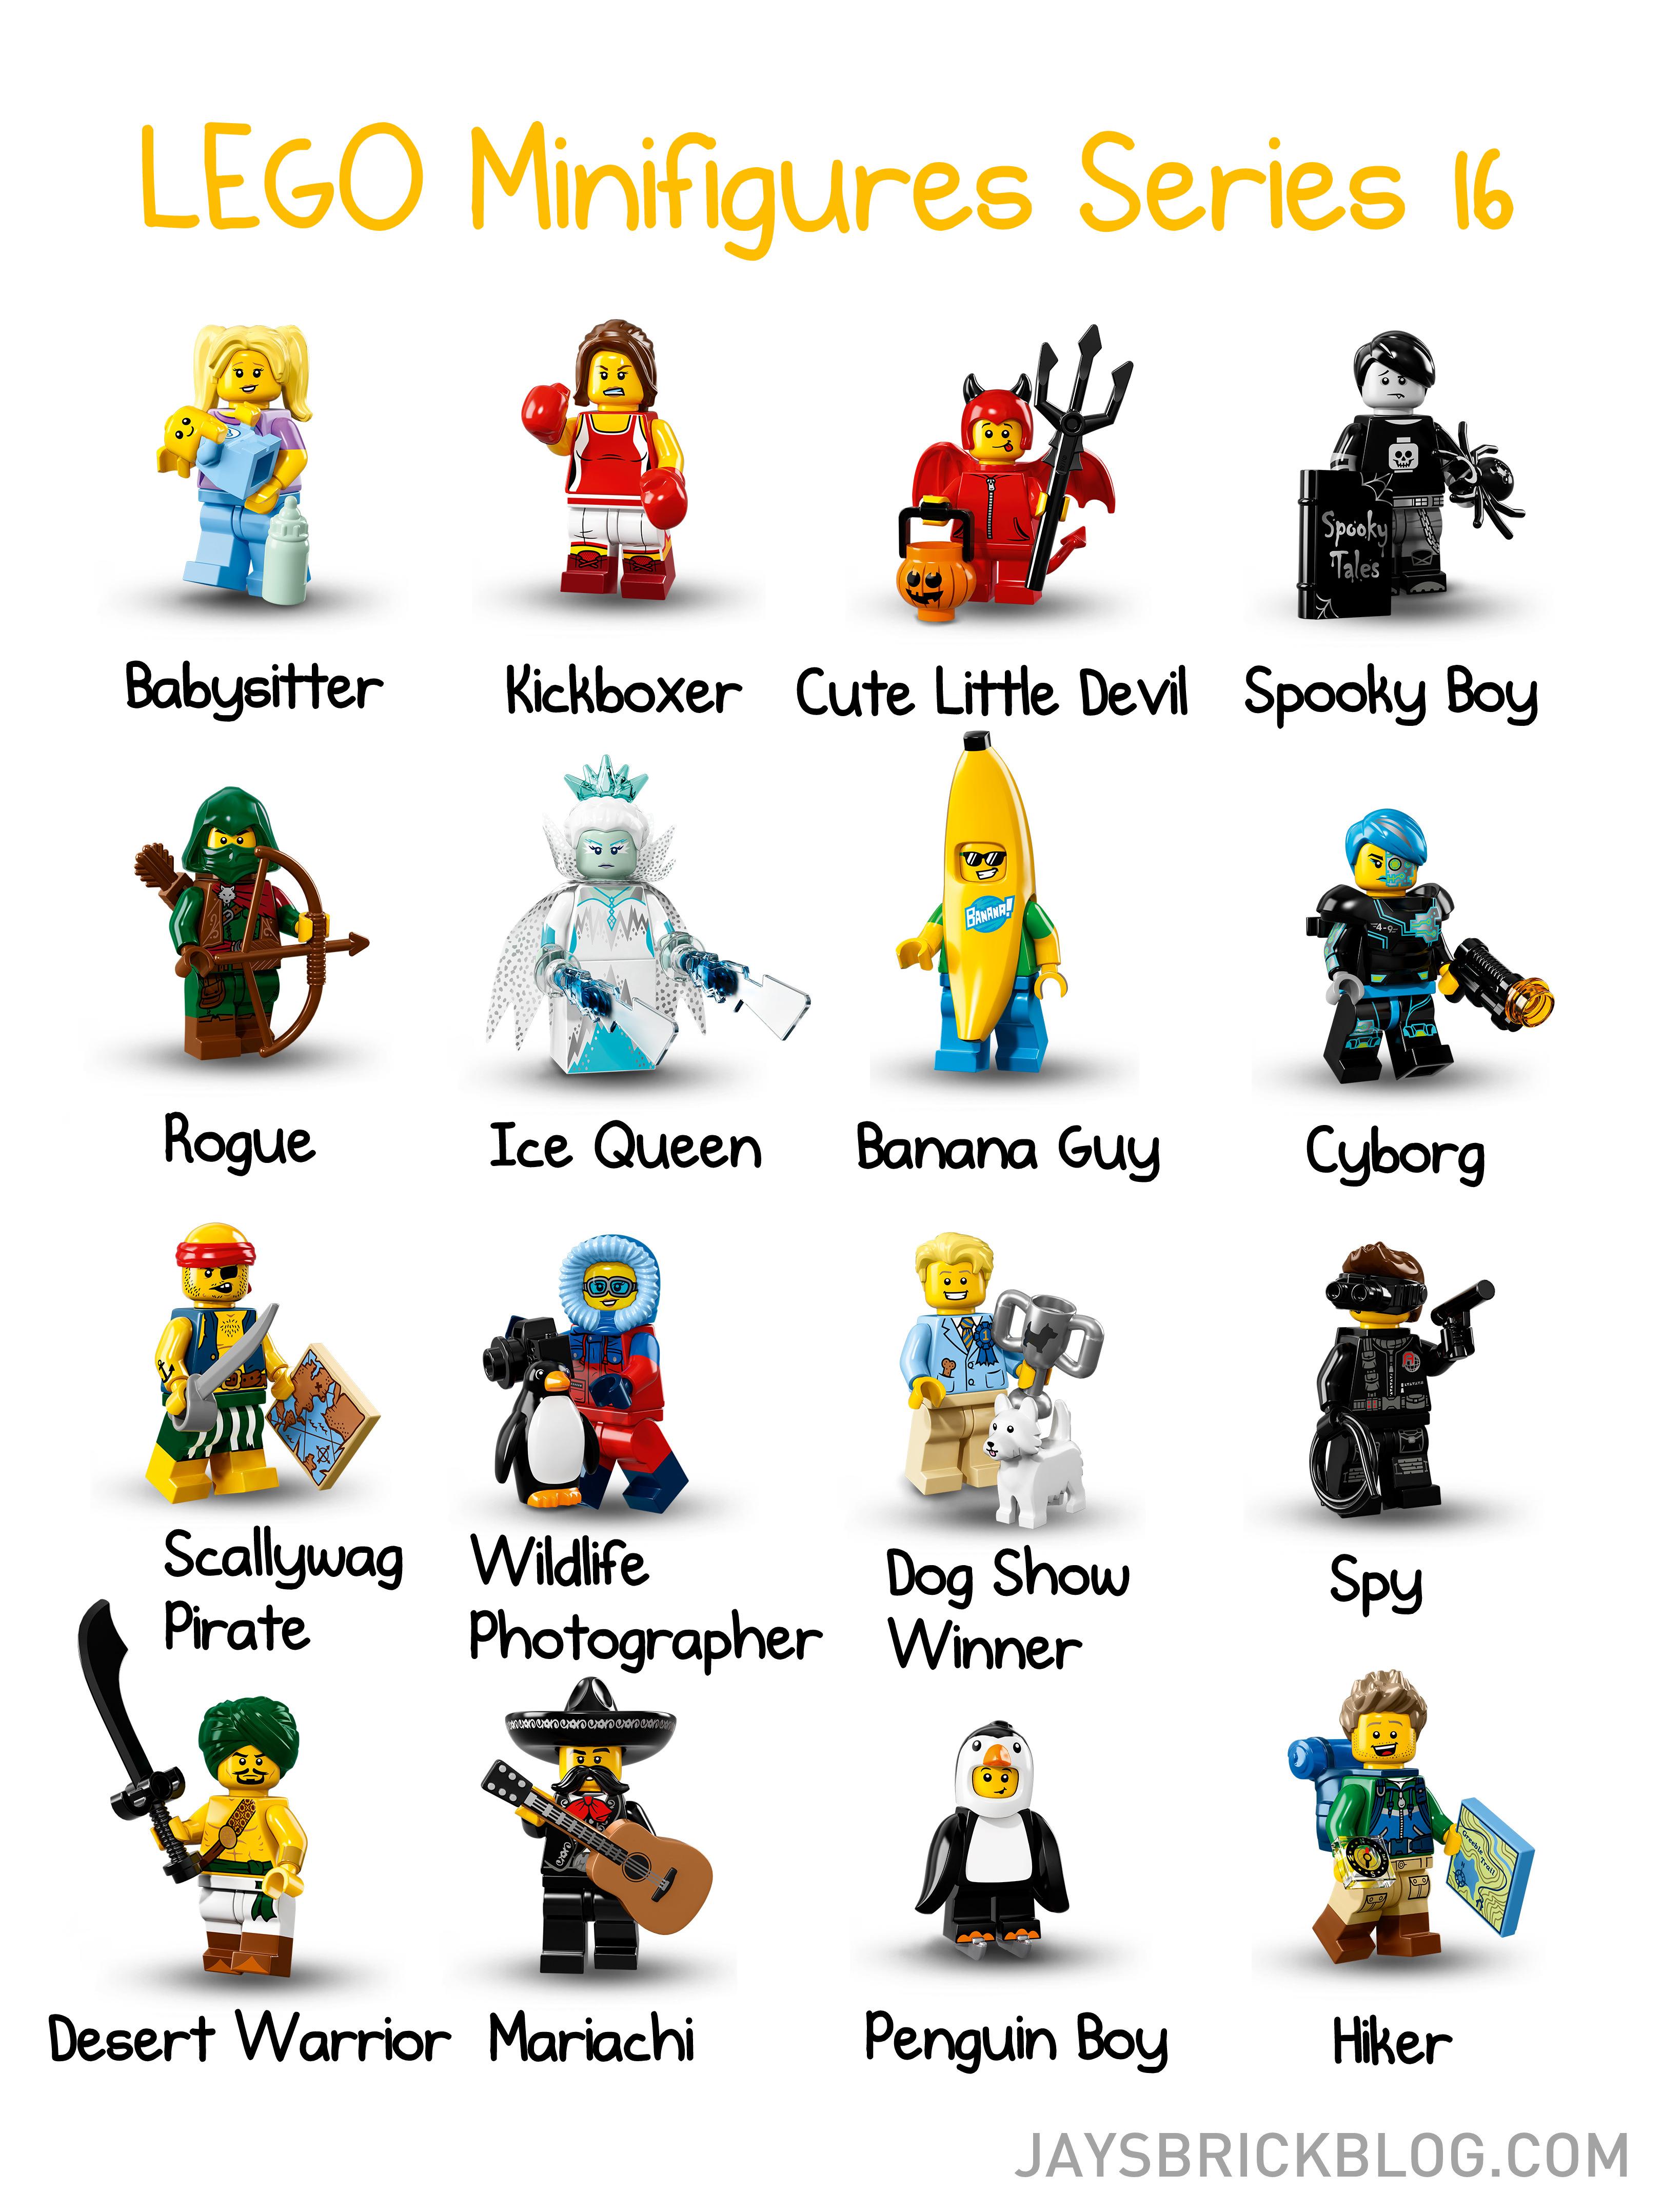 LEGO MINIFIGURES SERIES 16 71013 Hiker